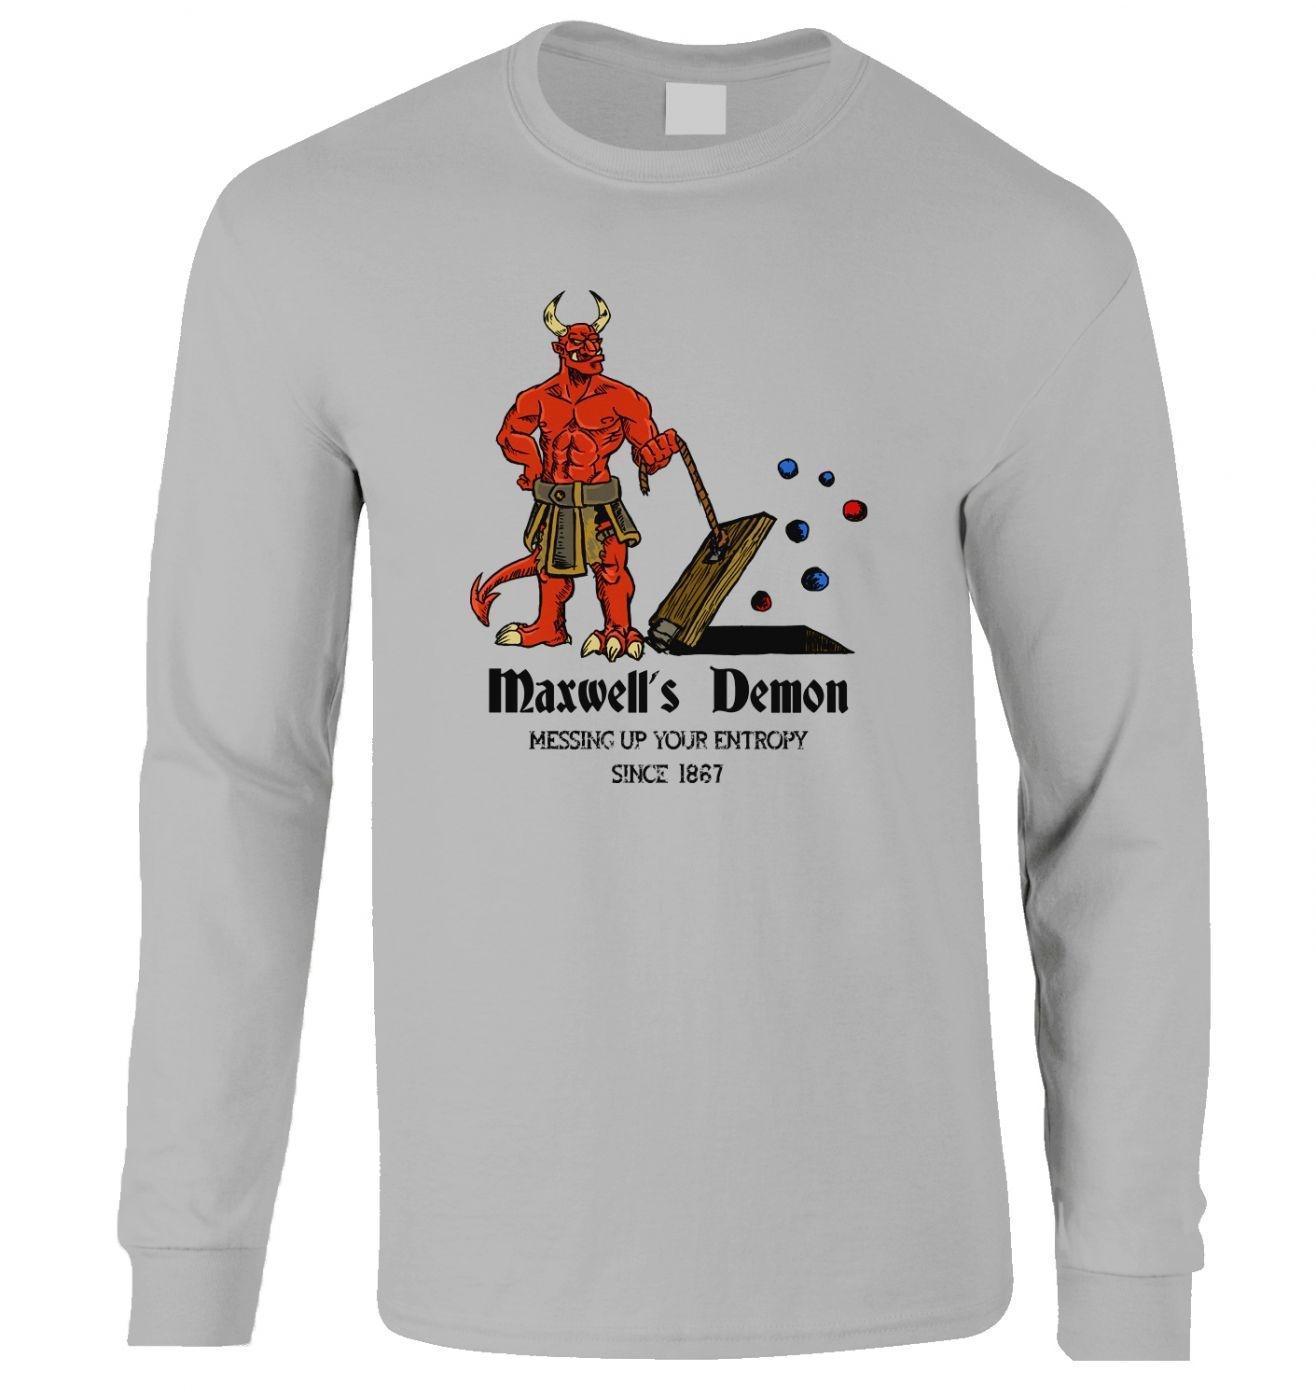 Maxwell's Demon long-sleeved t-shirt